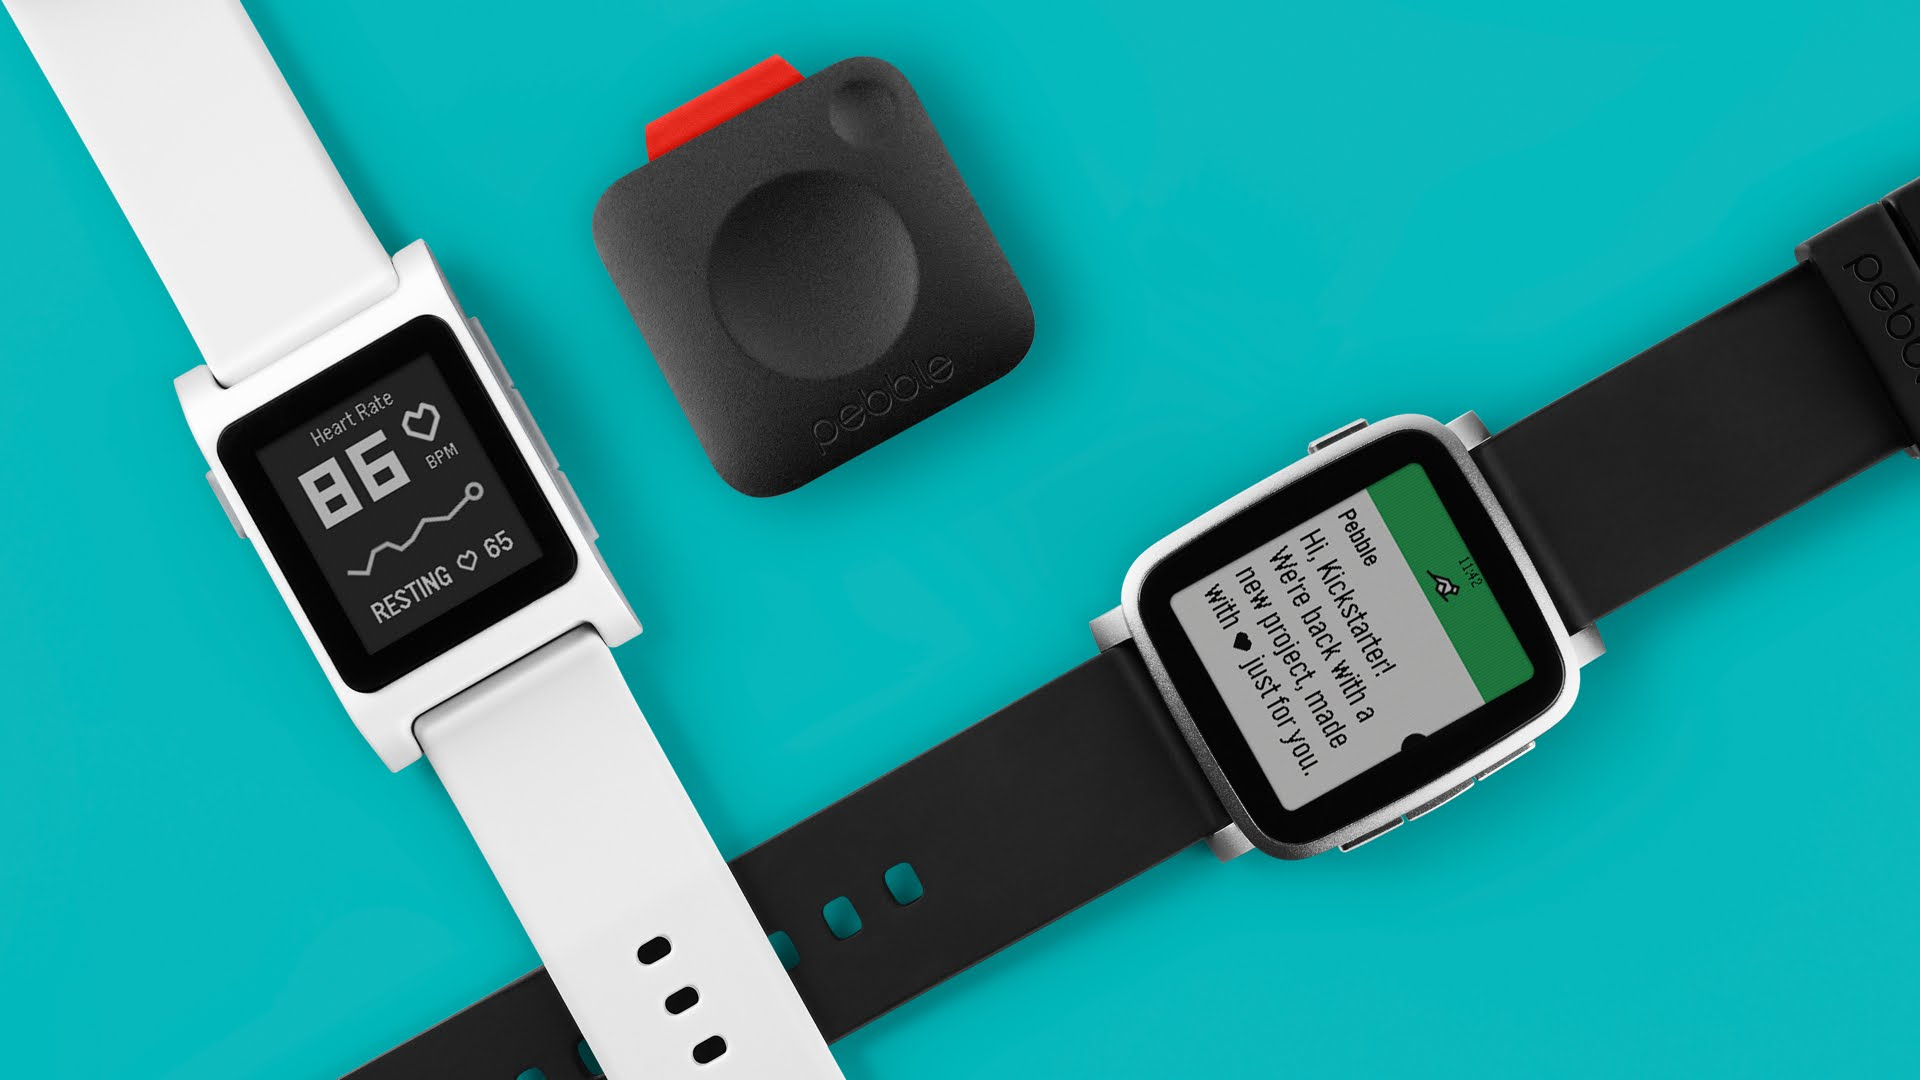 Pebble Smartwatch Family